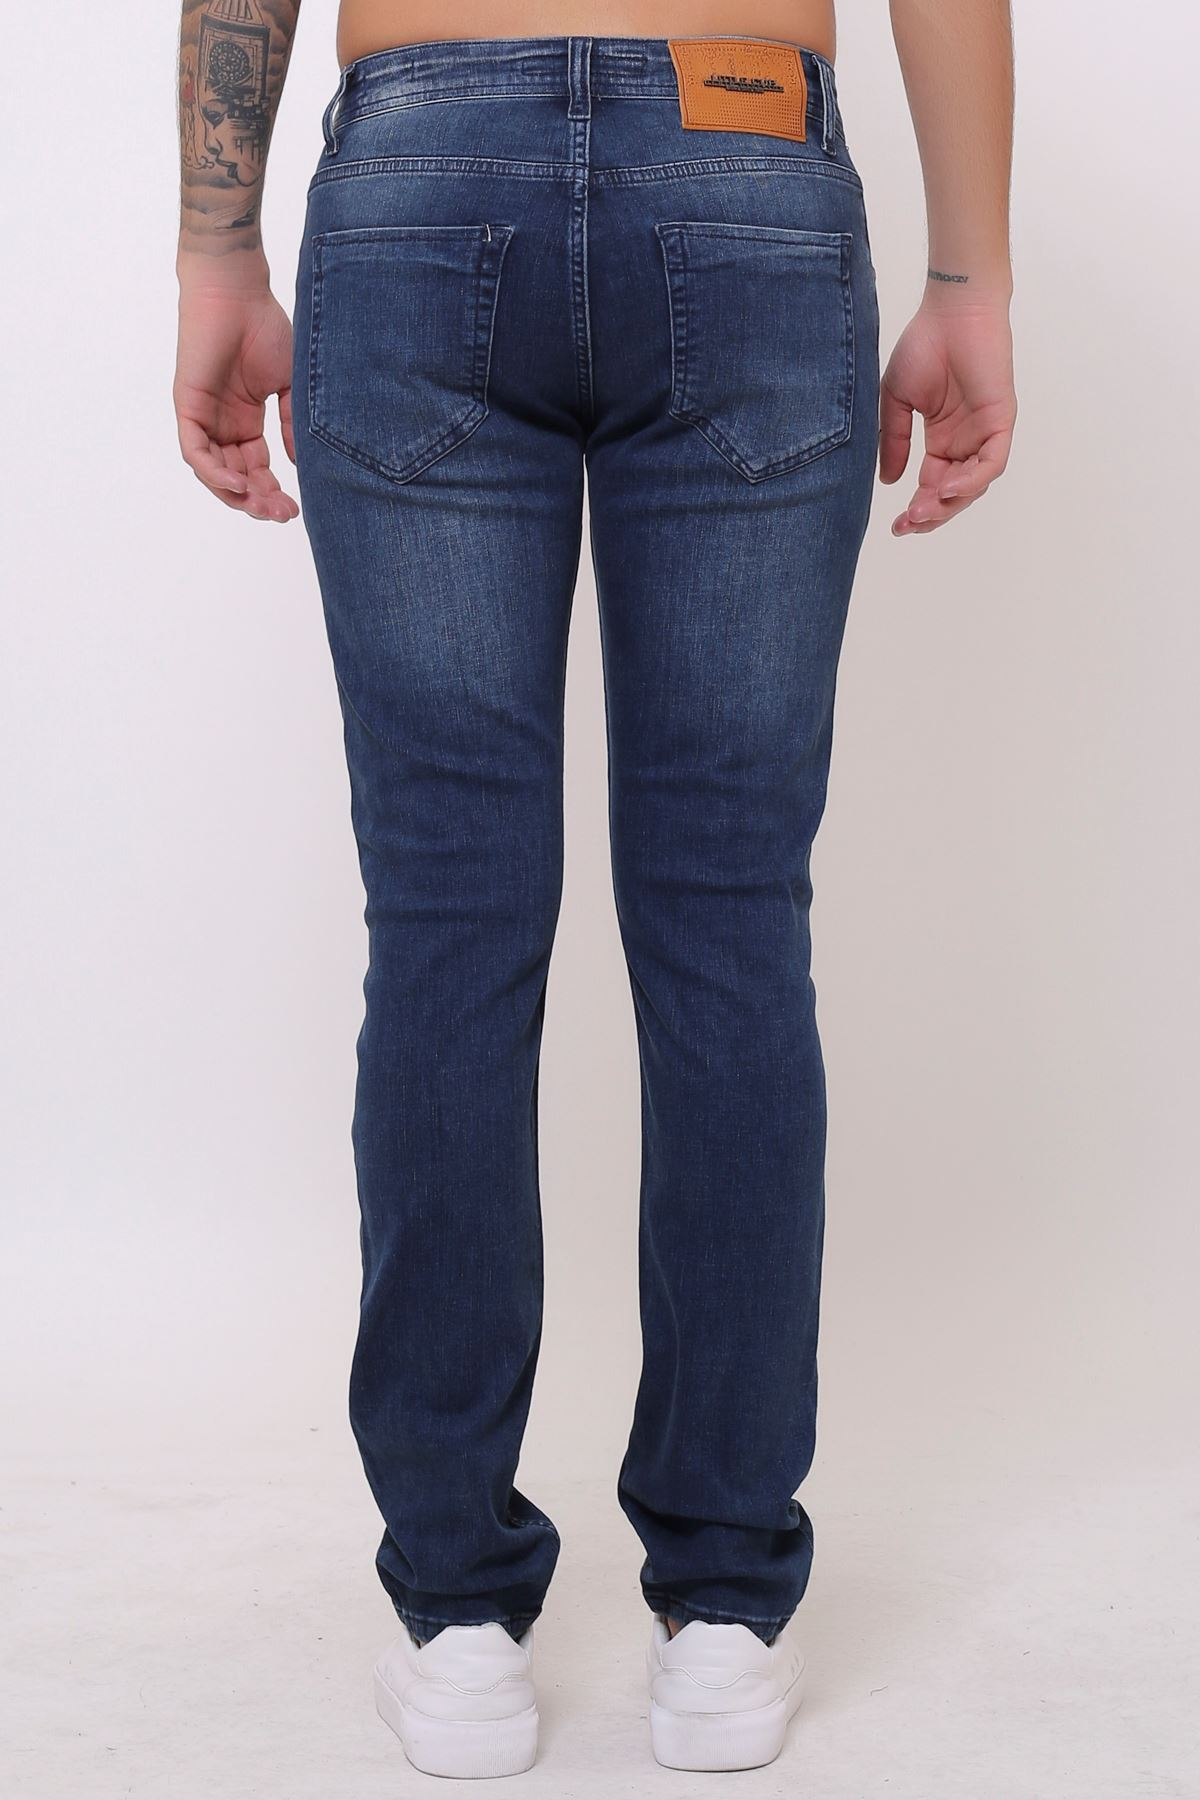 Yeni Mavi Tint  Slim Fit Fermuarlı Erkek Jeans Pantolon